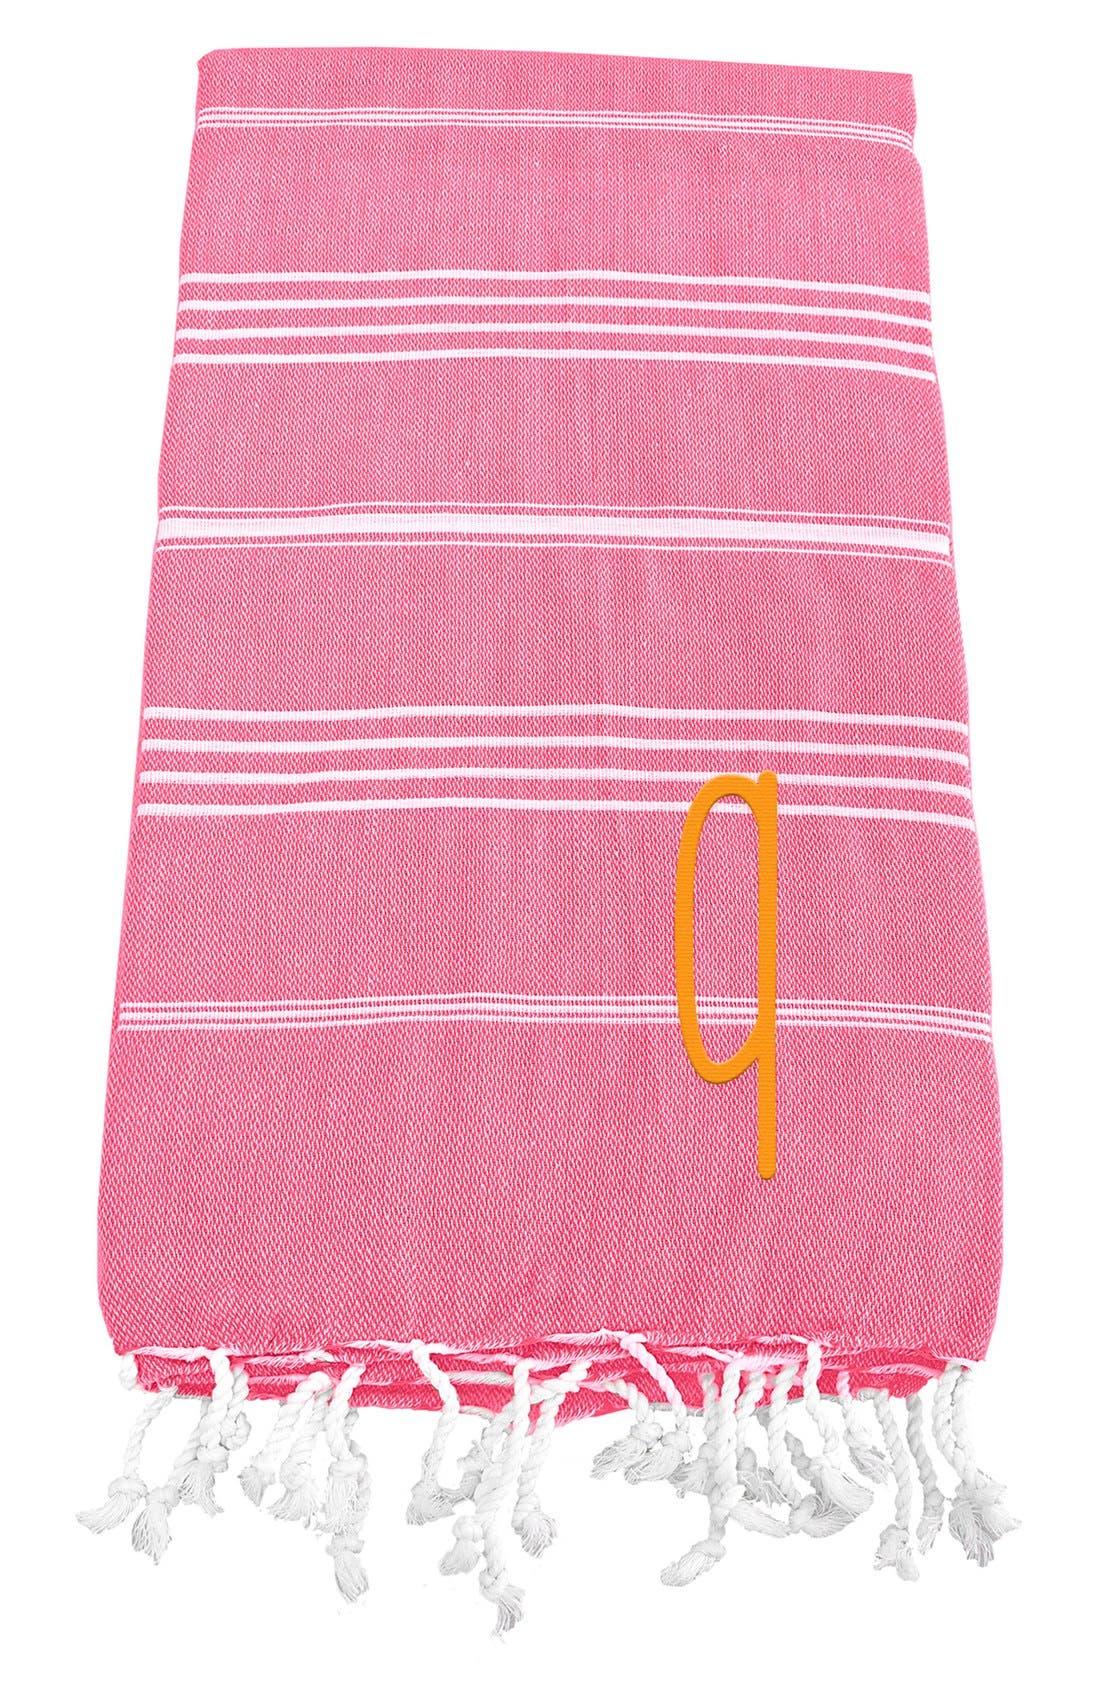 Monogram Turkish Cotton Towel,                             Main thumbnail 153, color,